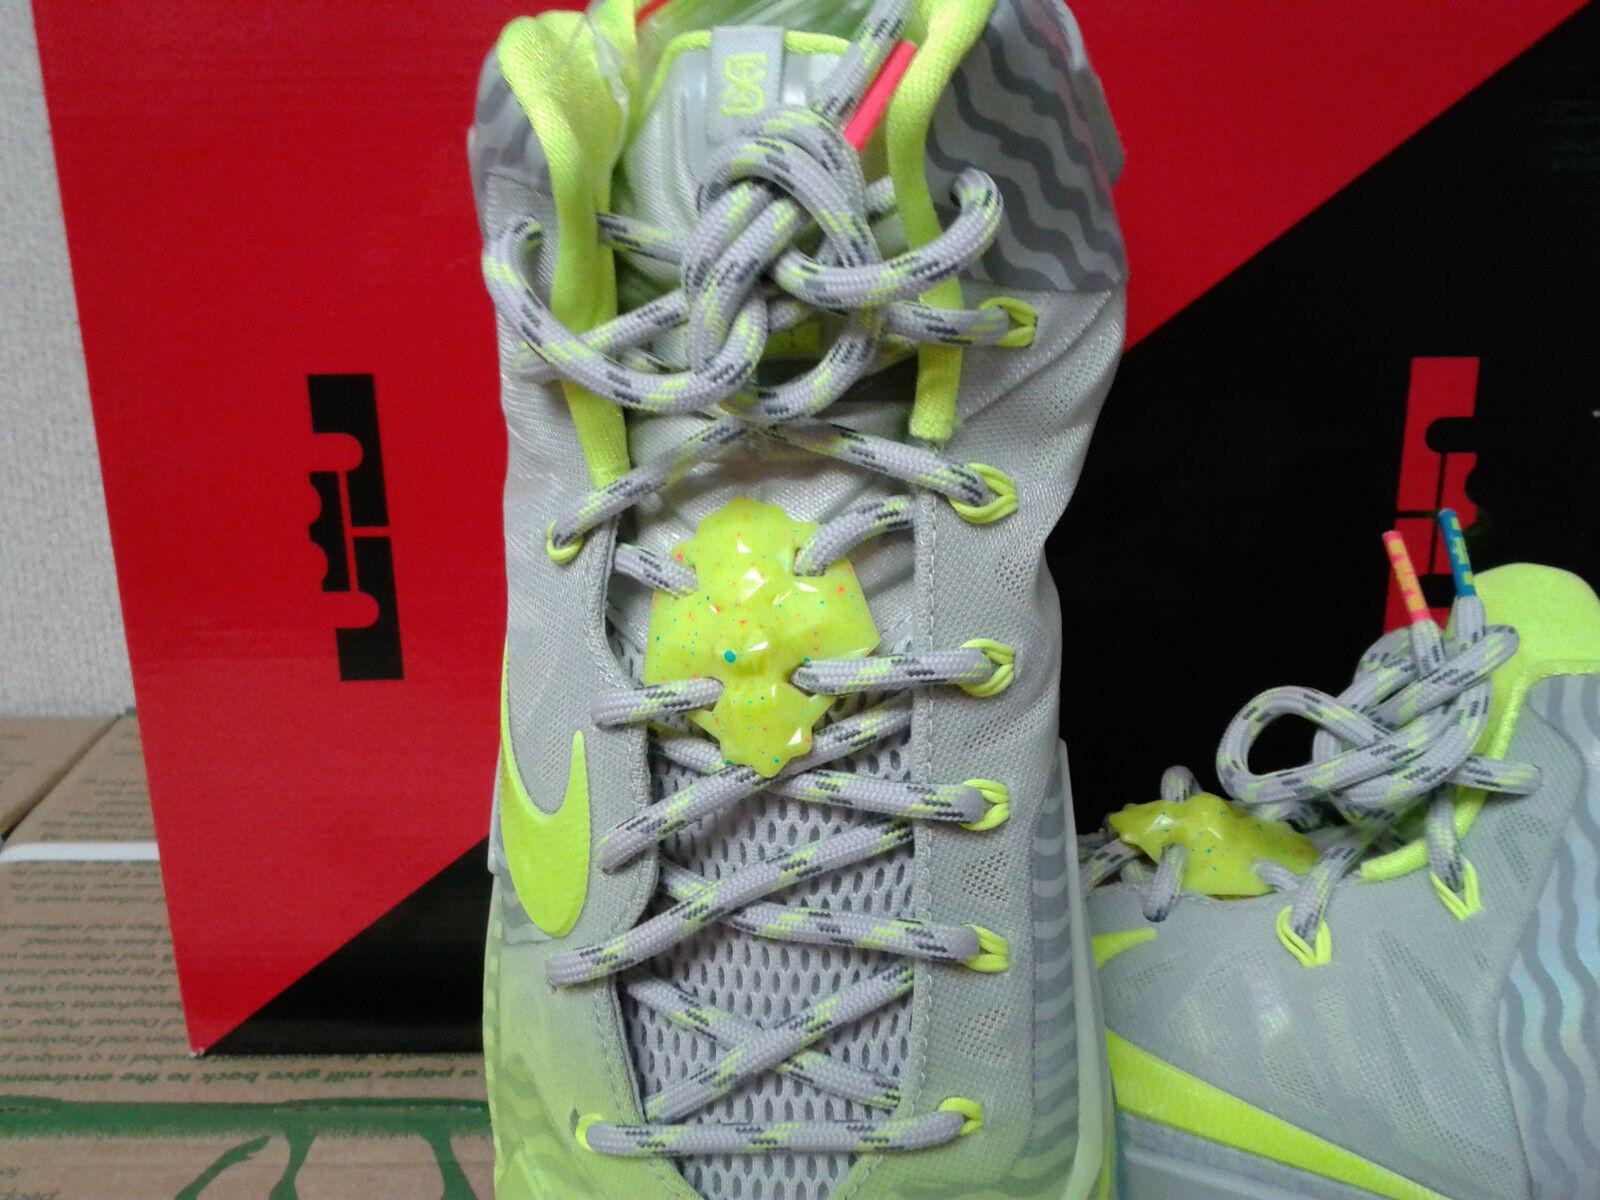 Nike lebron james xi maison du sammlung... mtlc lustr / volt volt / / eis...11. 67b022